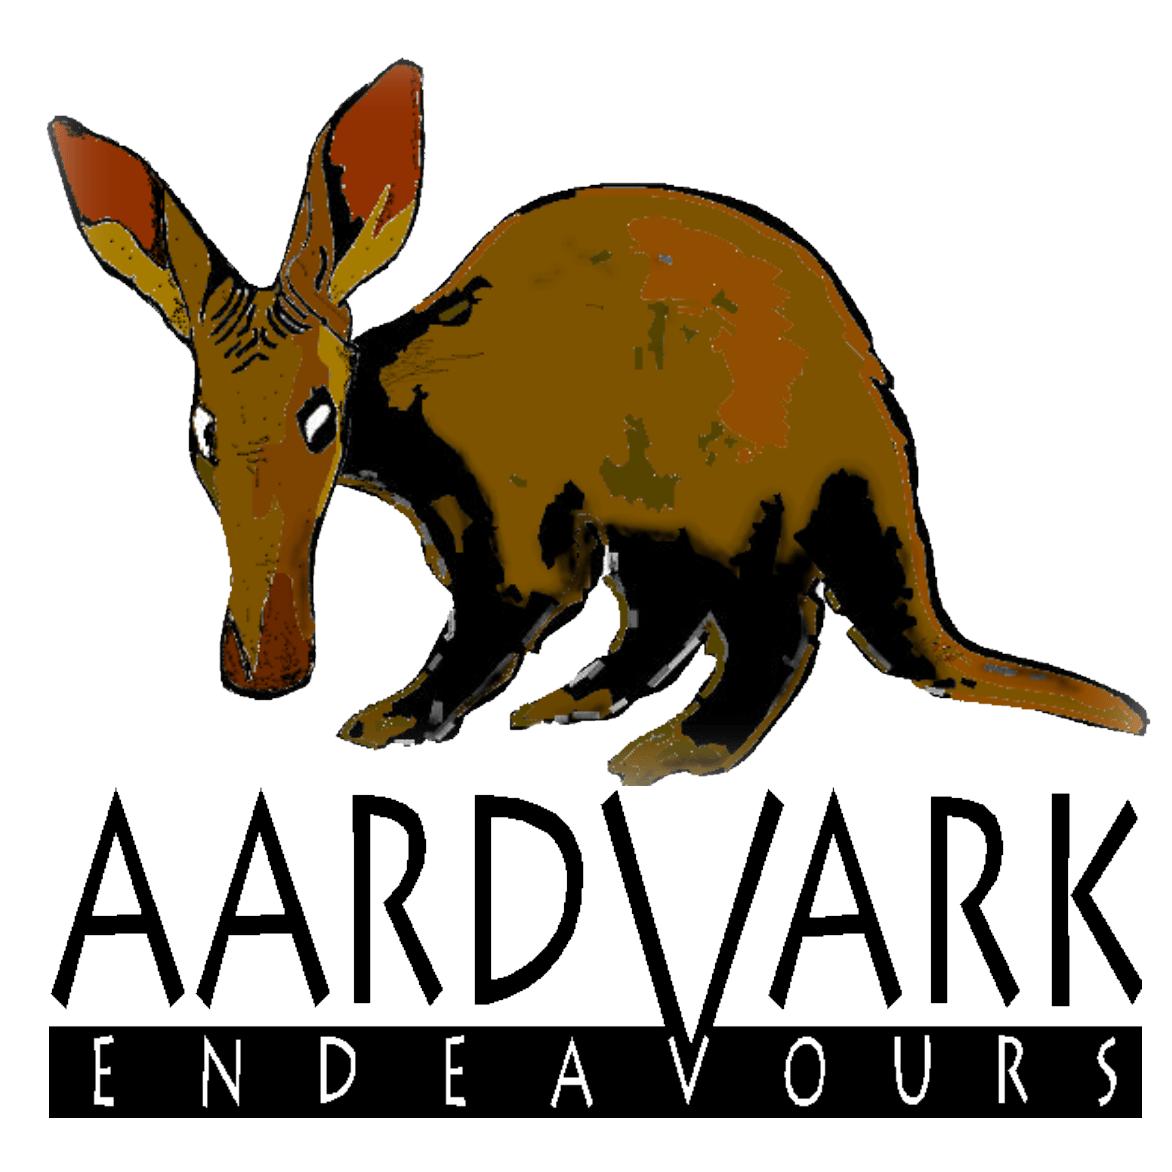 Aardvark Endeavours - Winscombe, Somerset BS25 1RA - 01934 843062 | ShowMeLocal.com